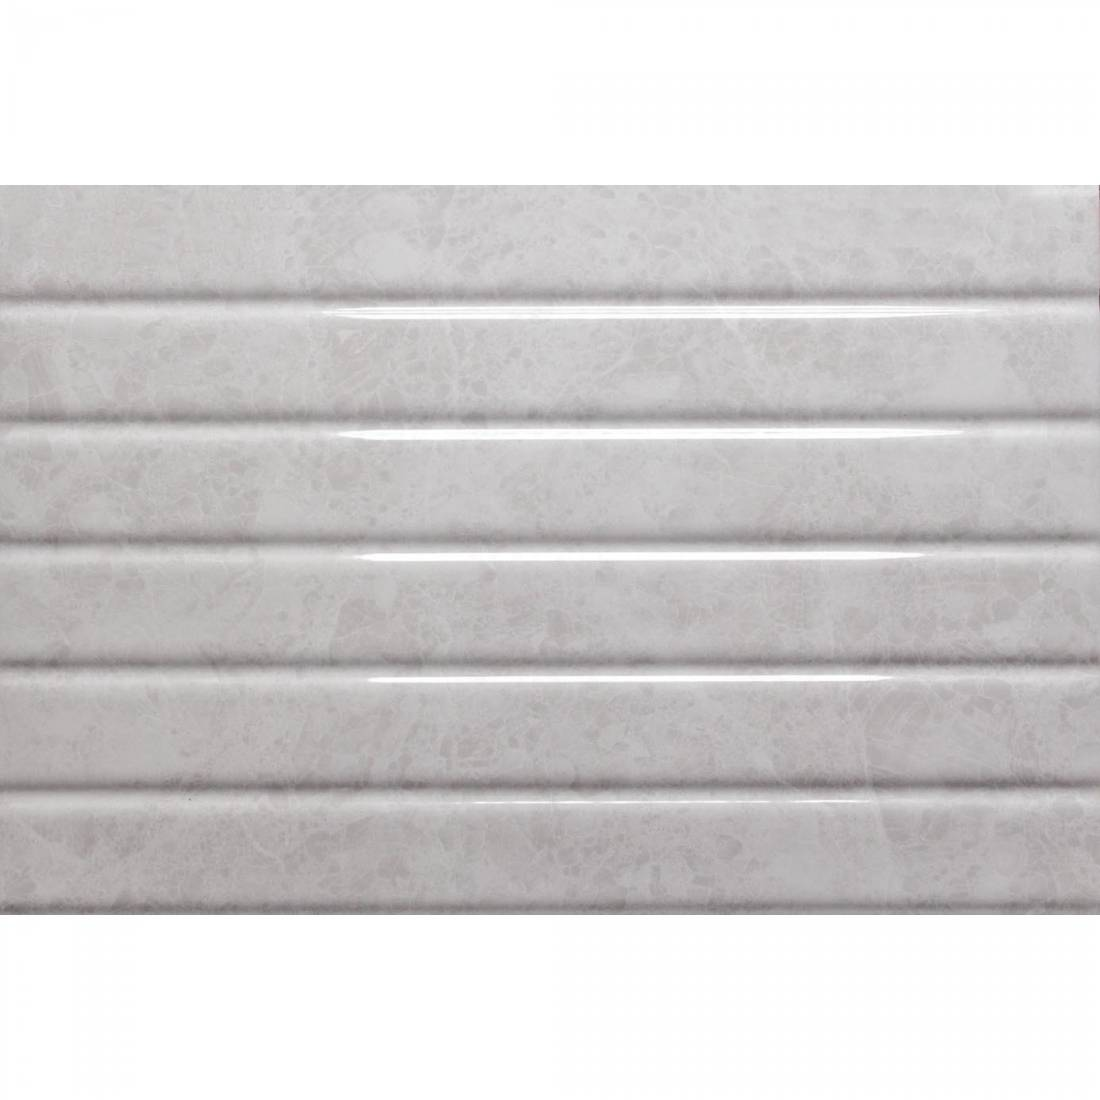 Stroud Relief Decor 30x45 Light Grey 1